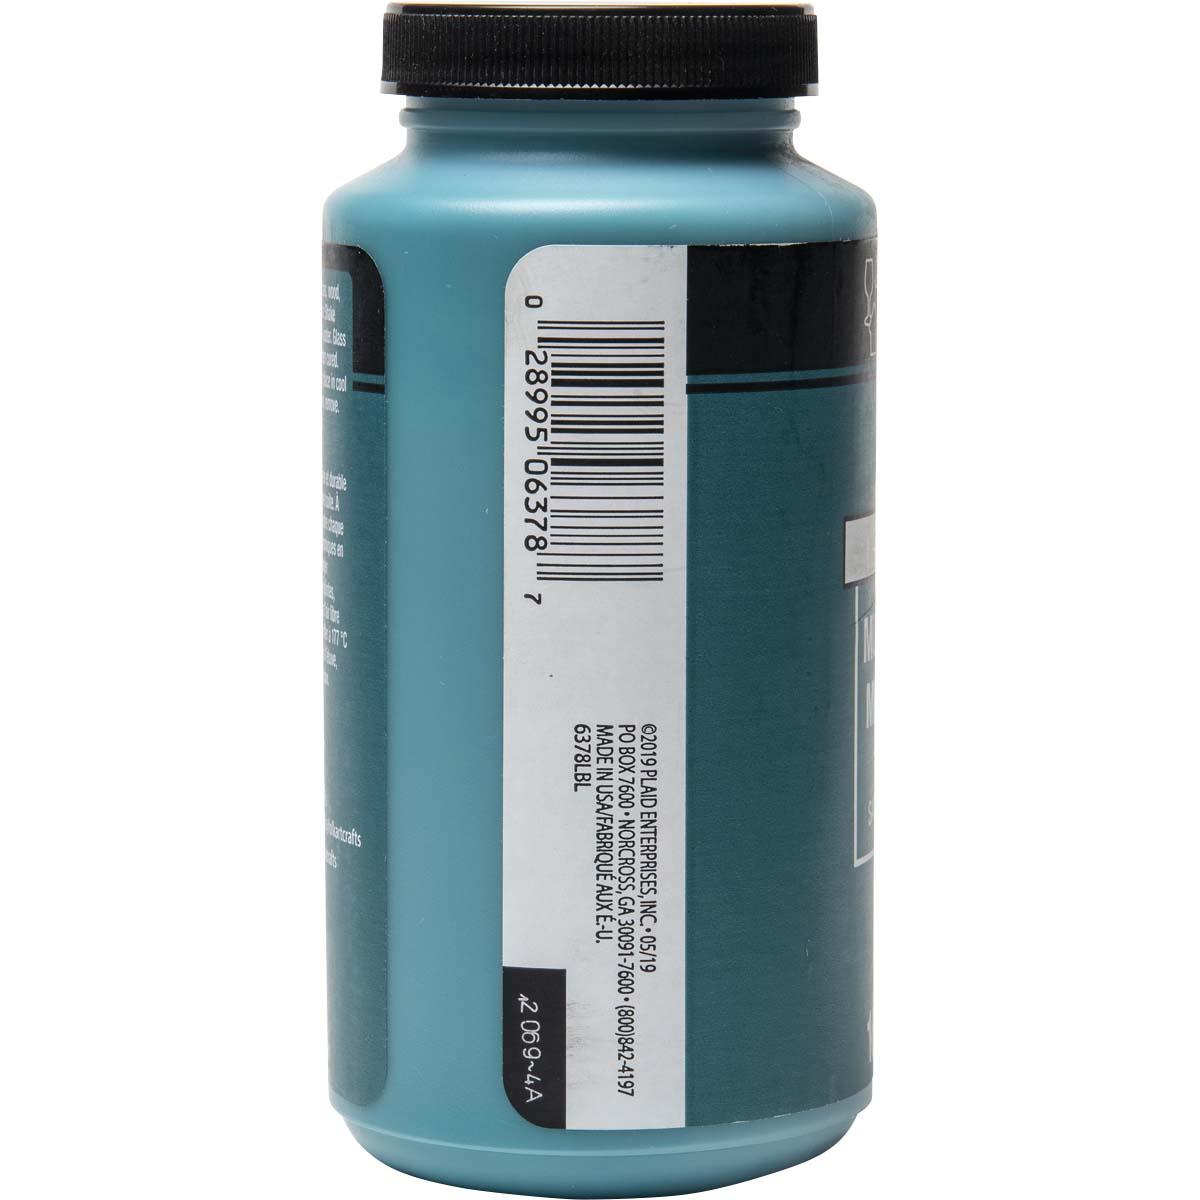 FolkArt ® Multi-Surface Satin Acrylic Paints - Teal, 16 oz. - 6378